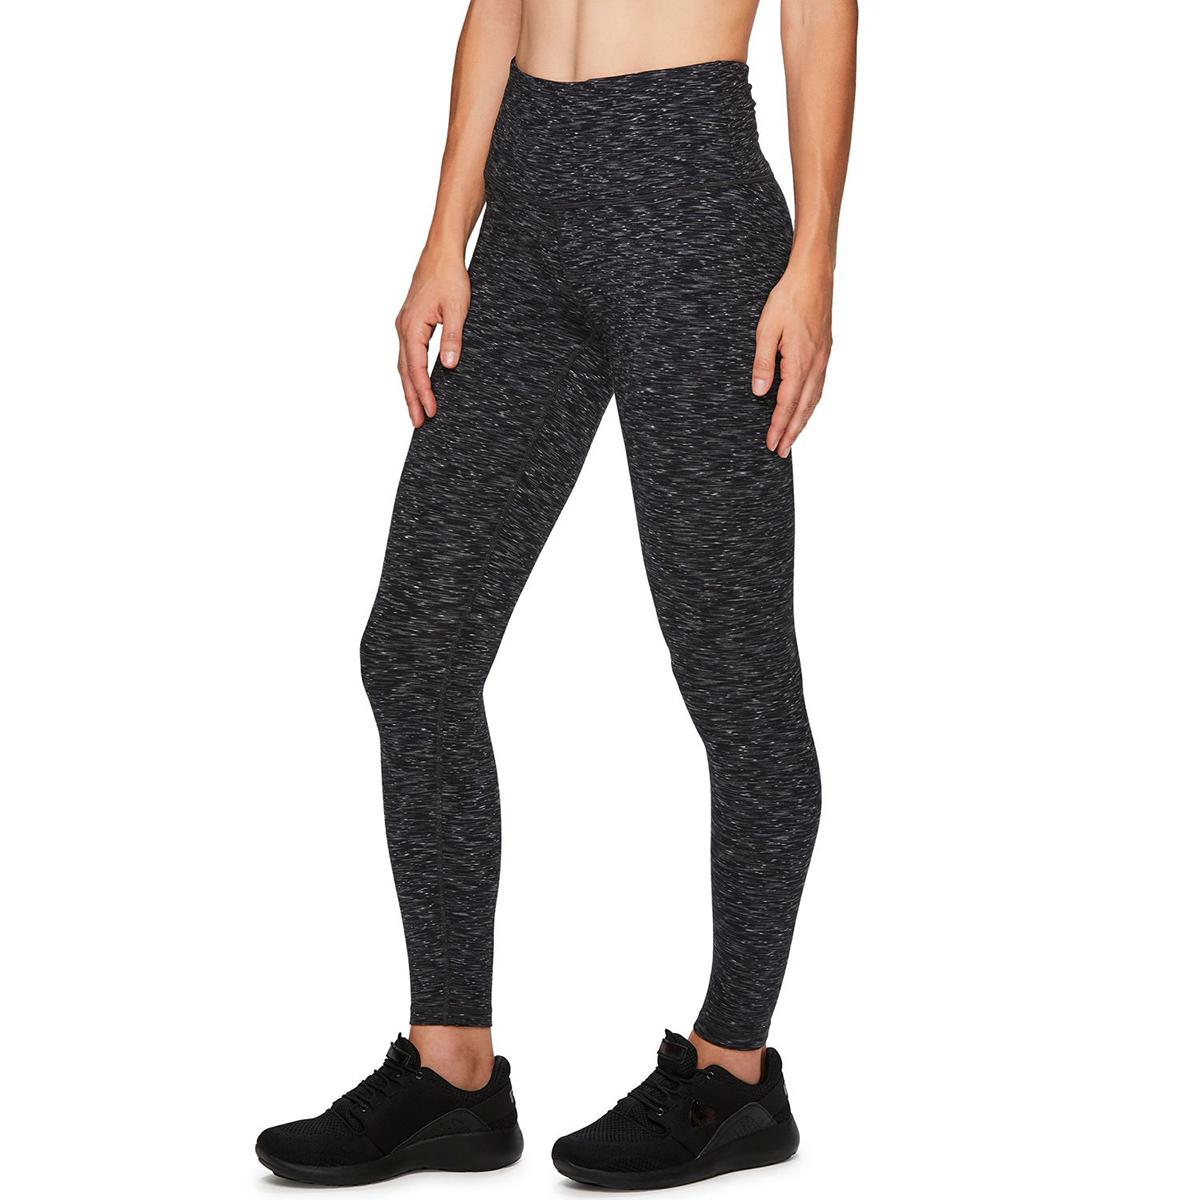 RBX Women's Peached Space Dye Full Length Leggings - Black, L